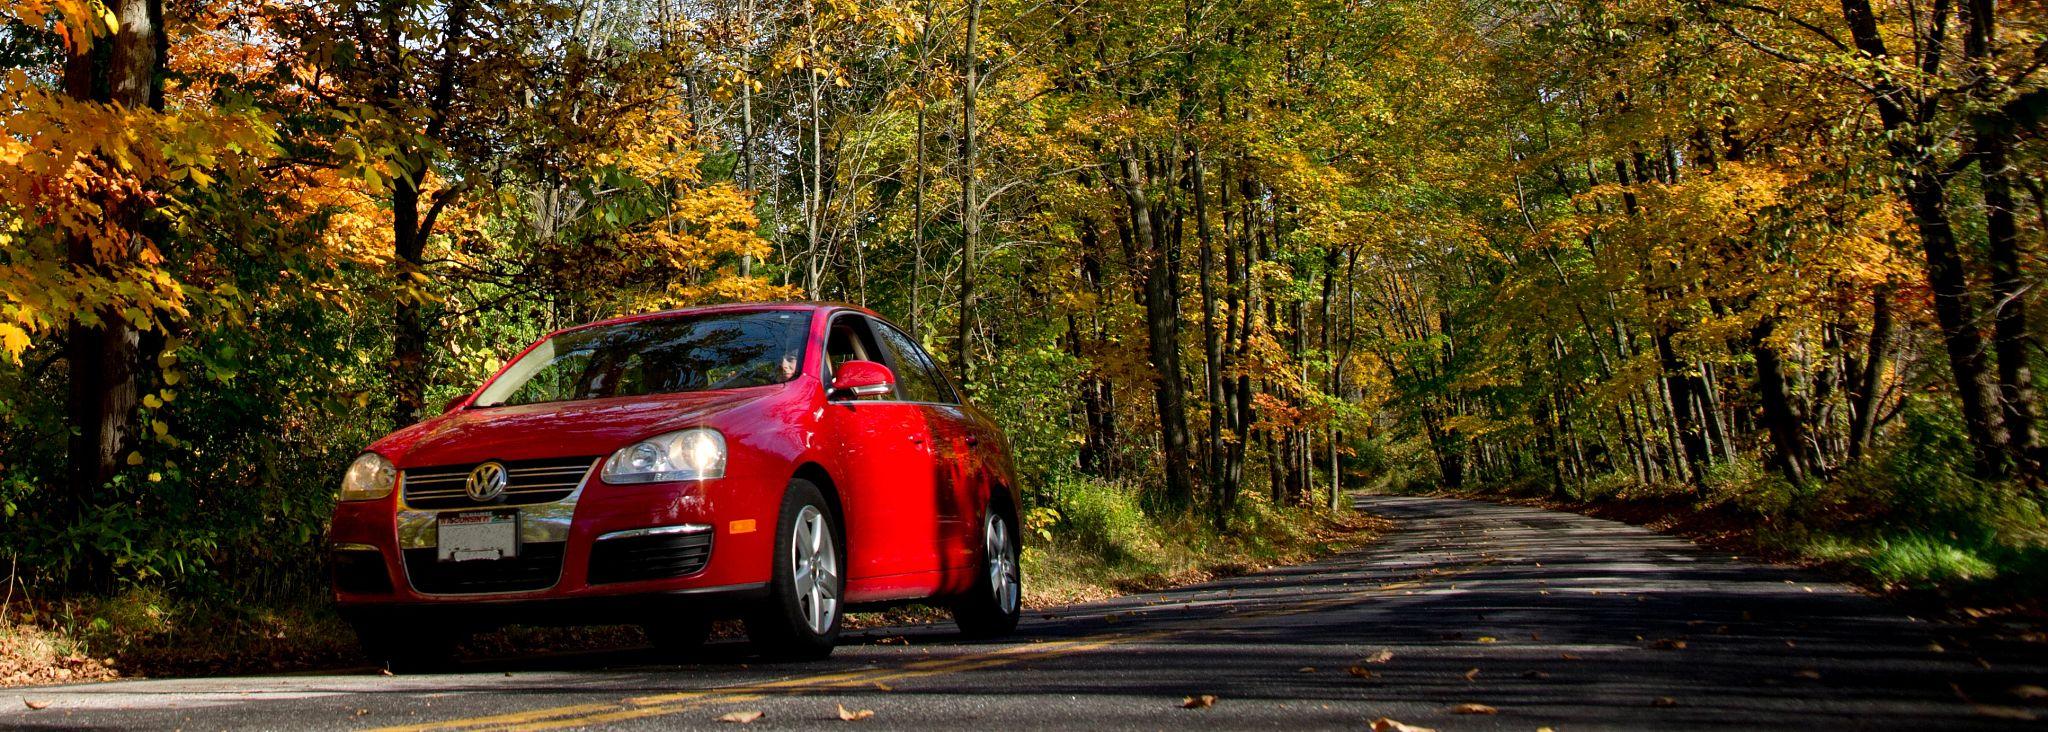 Fall-scenic-drive-1.jpg